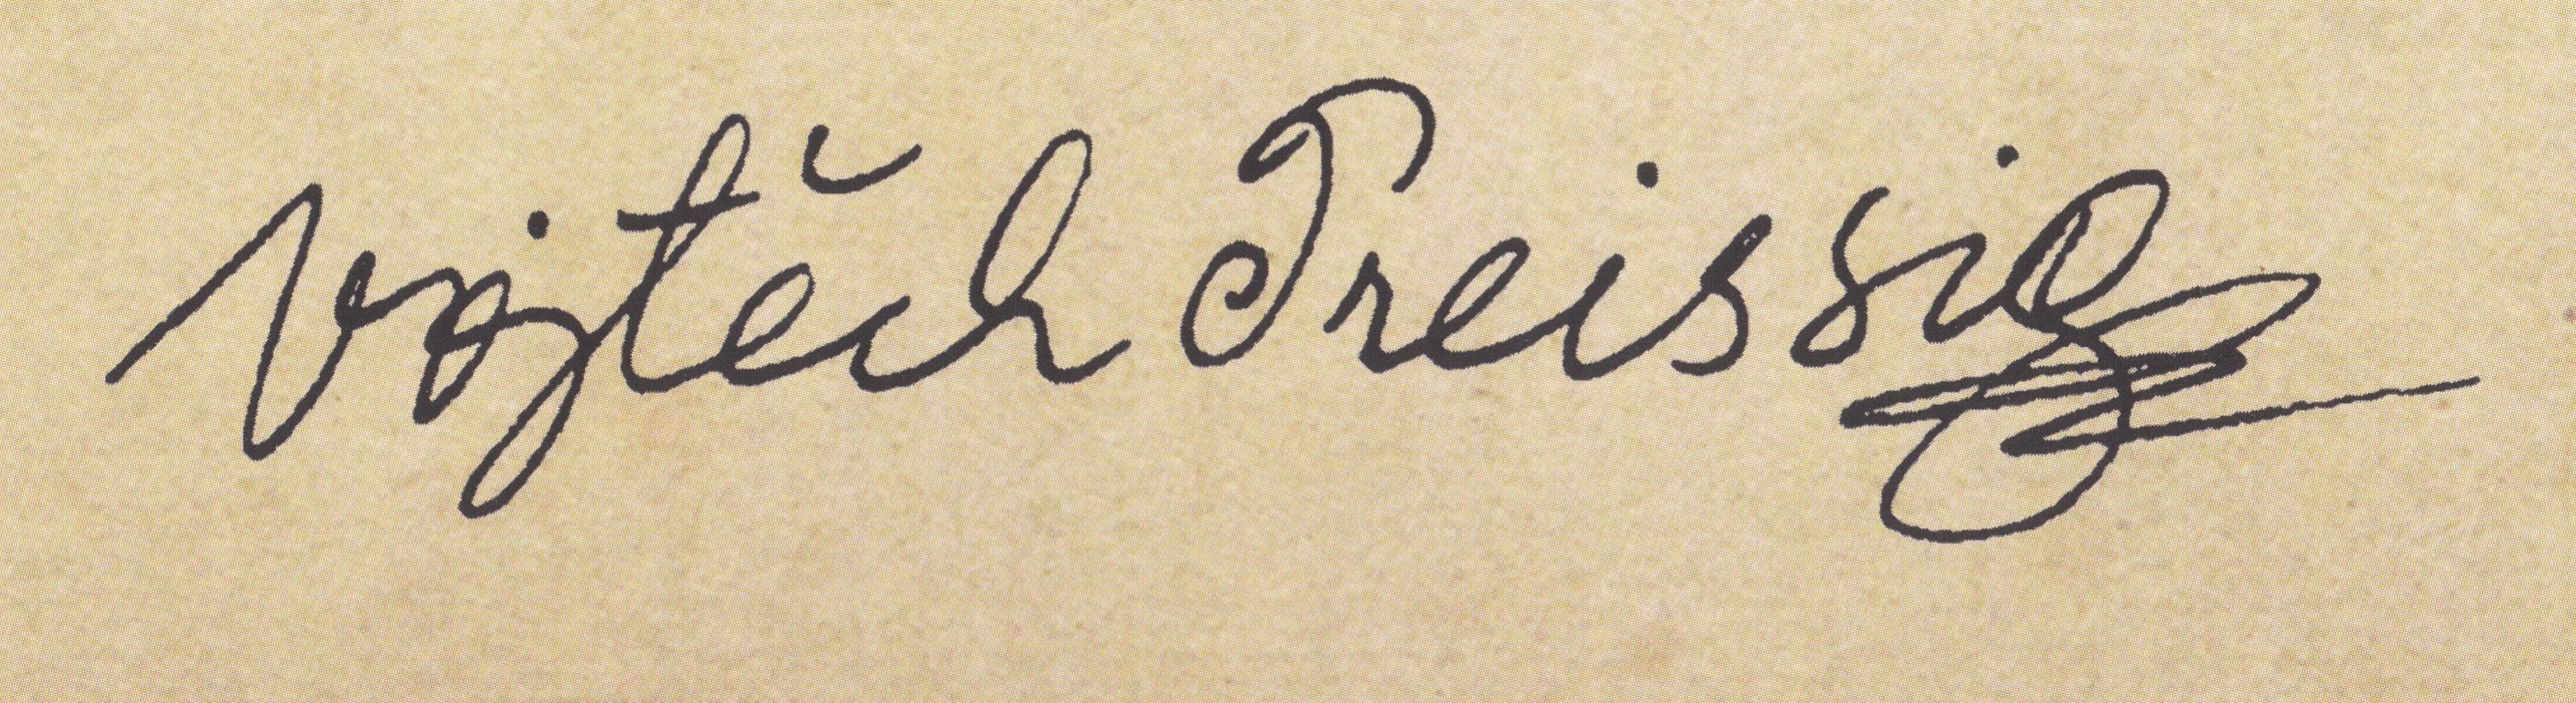 Commons Public Domain Mark 1.0falsefalse English Full signature of Czech graphic artist, typographer, painter and illustrator Vojtěch Preissig (* 1873 - † 1944)